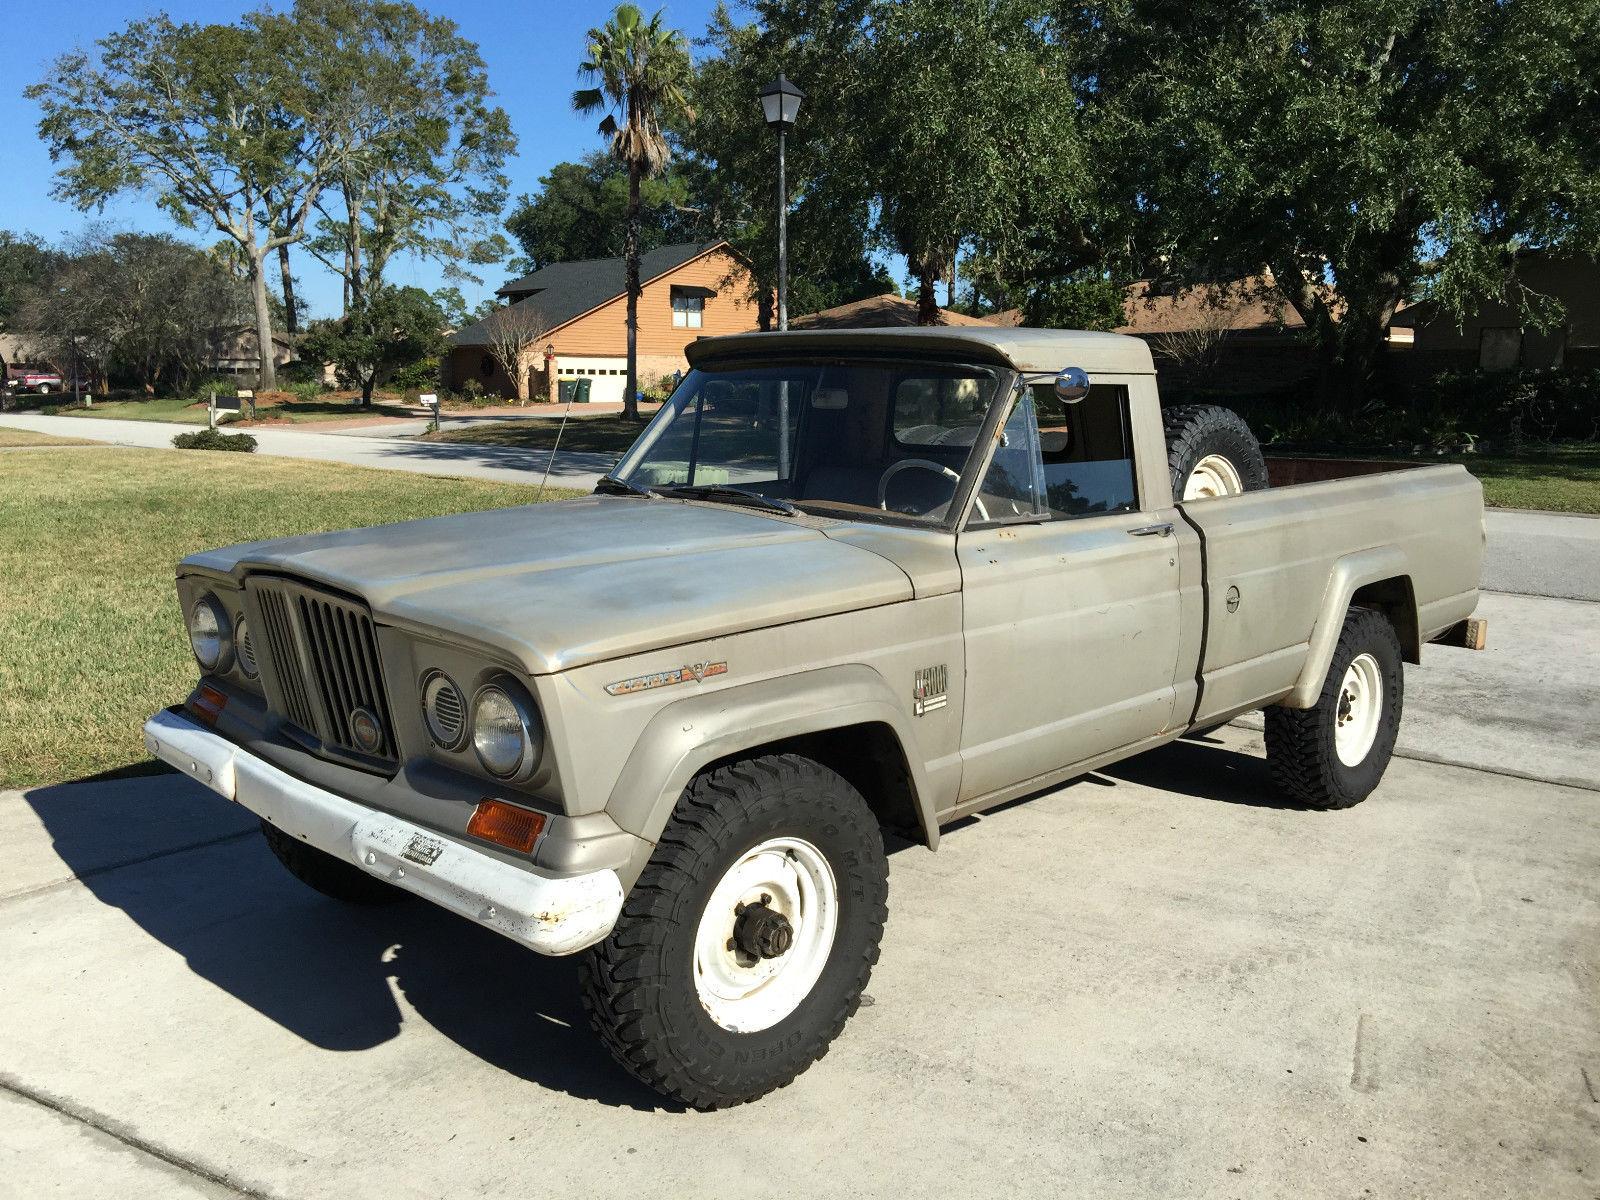 1967 Jeep Gladiator J10 J3000 Pickup Truck Barn Find